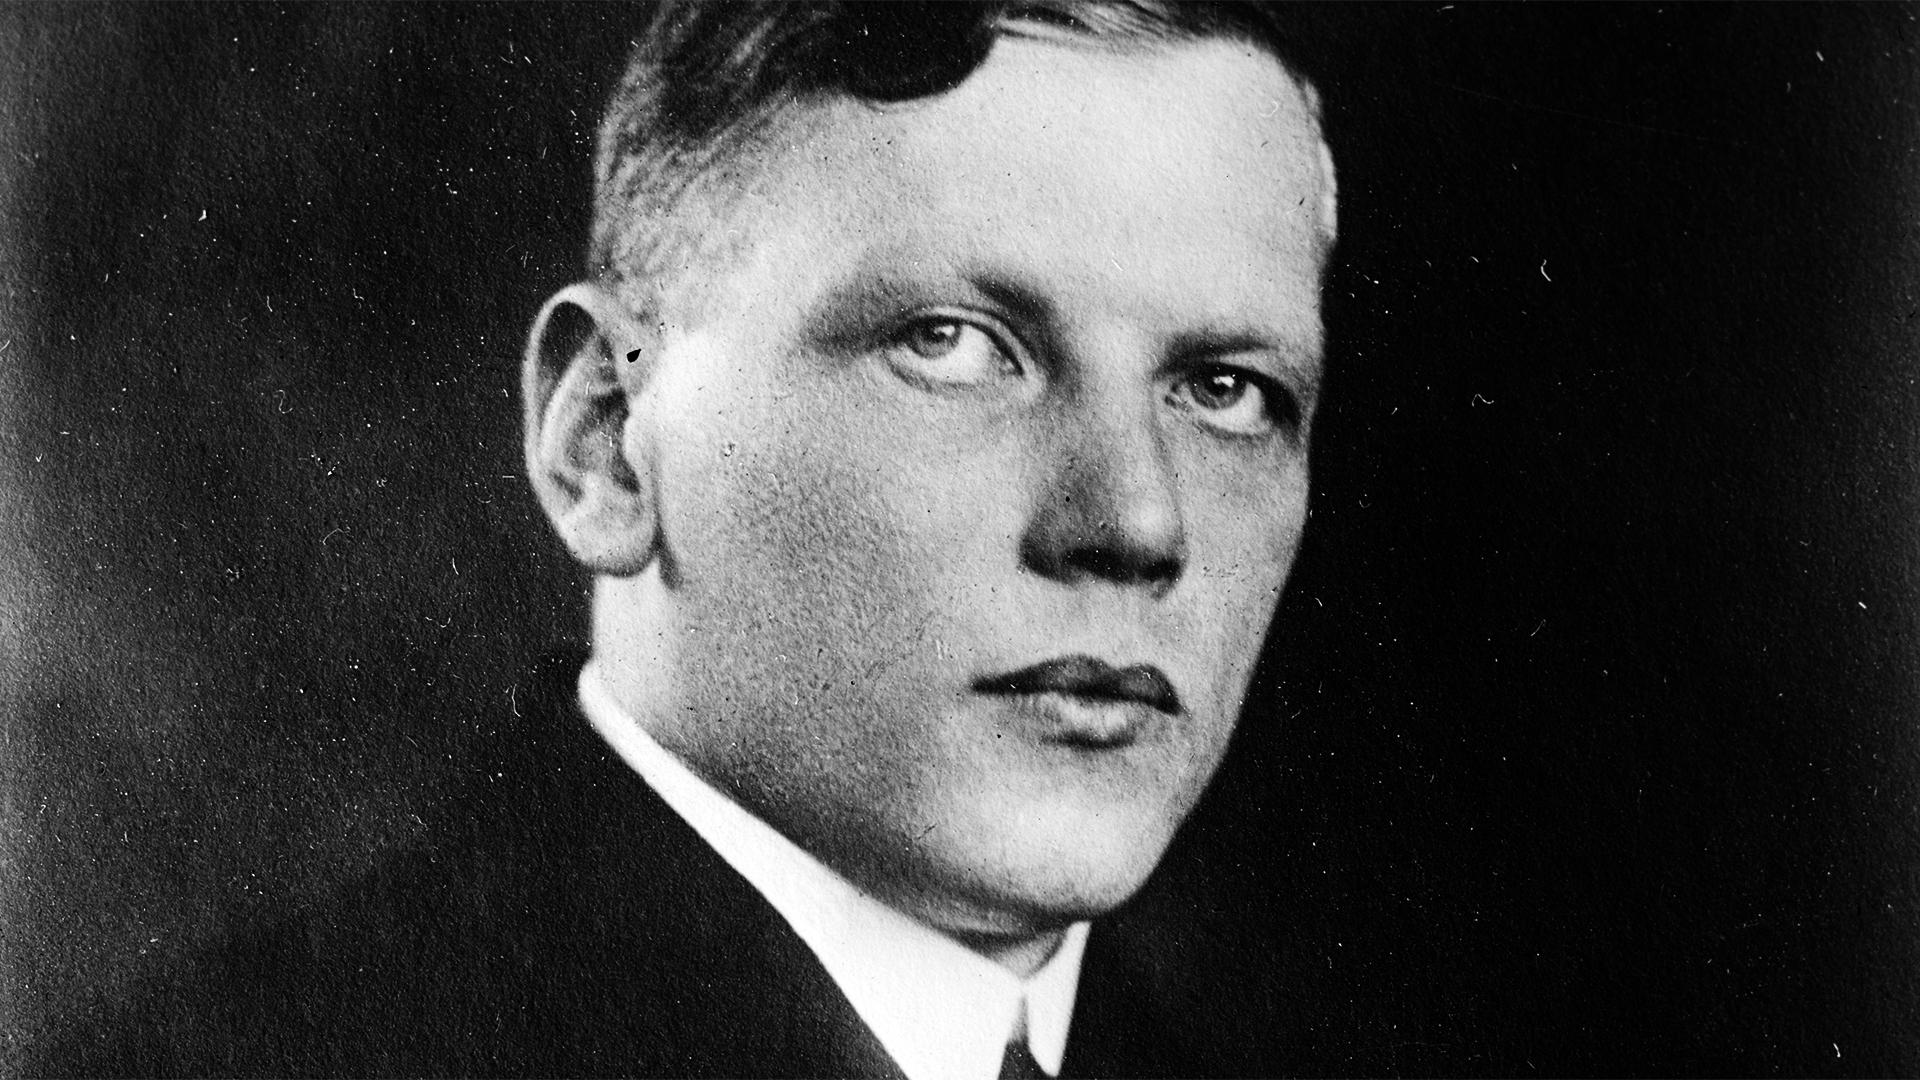 P2 Guldkoncerten: Hans Knappertsbusch og Wiener Filharmonikerne